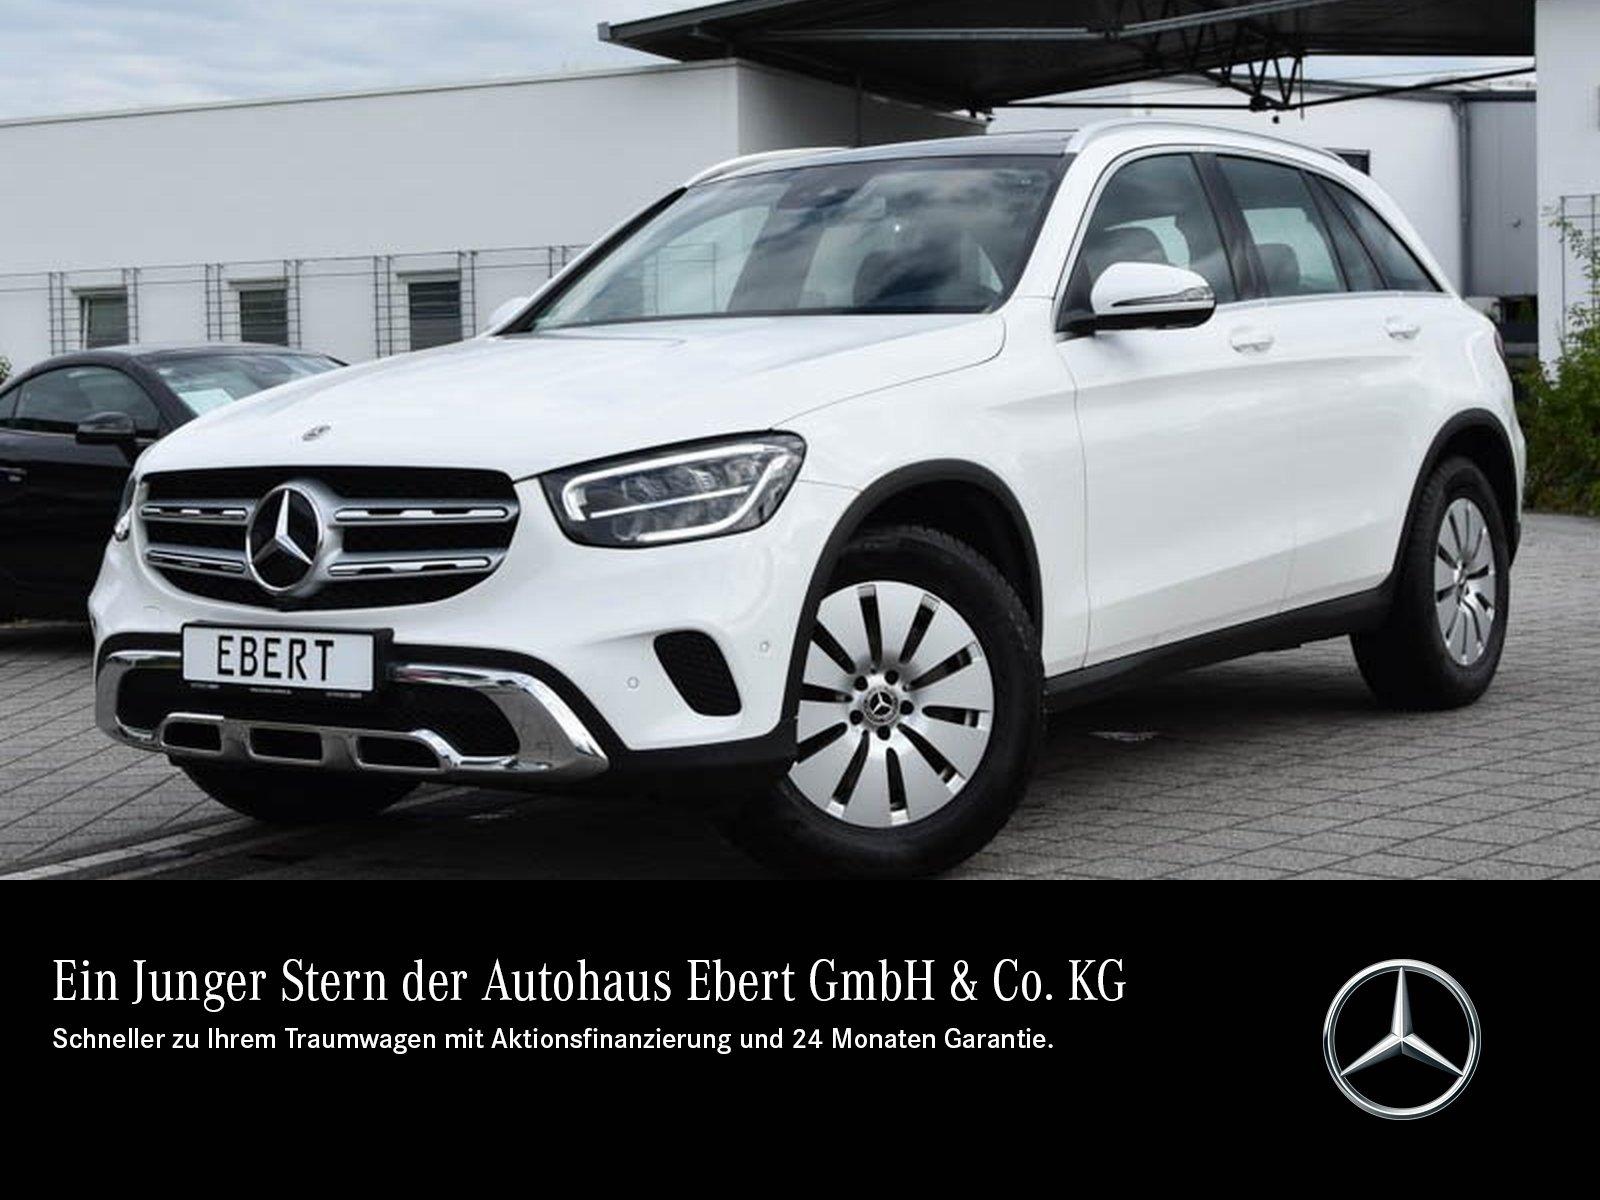 Mercedes-Benz GLC 200 4M 9G+NAVI-PREMIUM+PSD+LED+360°+EASY, Jahr 2019, Benzin